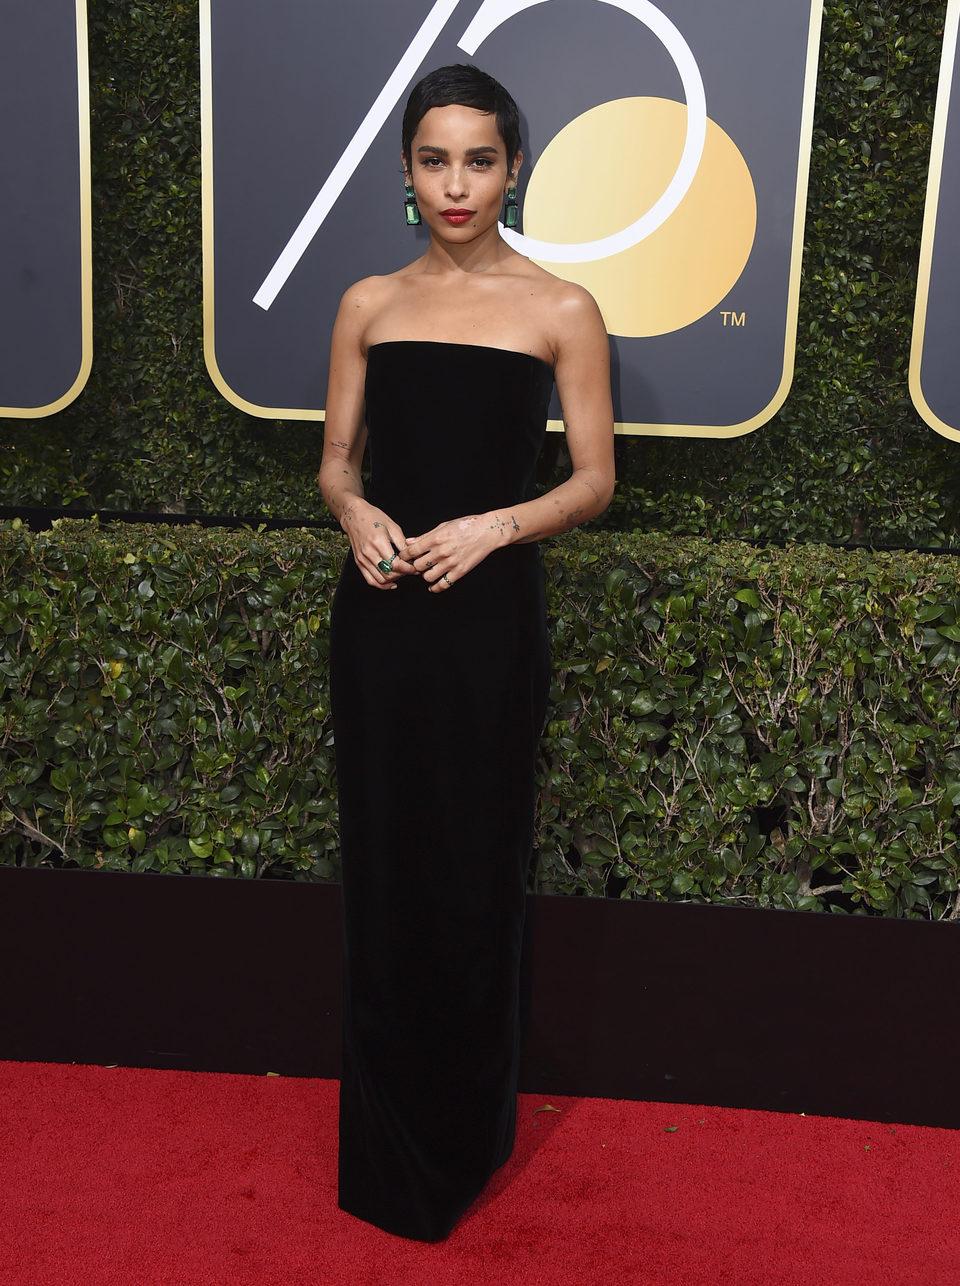 Zoe Kravitz at the Golden Globe's red carpet 2018